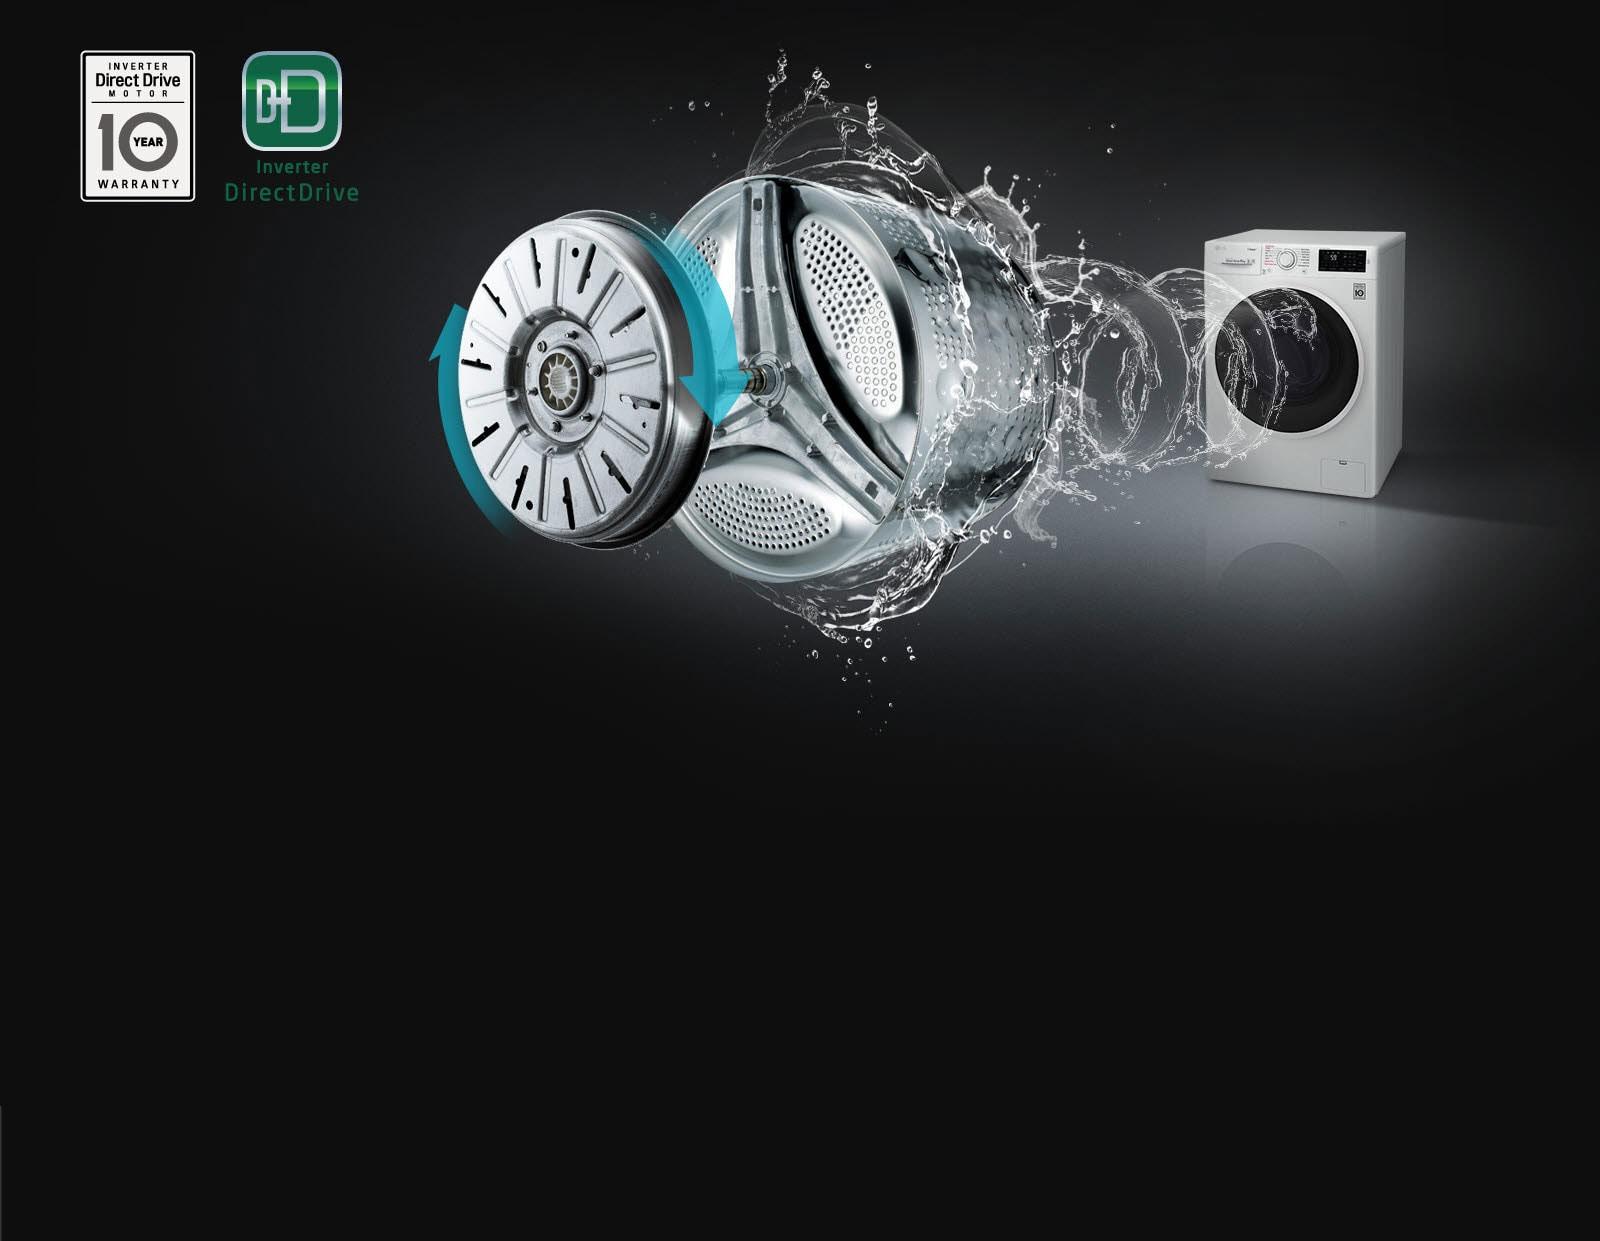 lg-lavatrice-FH2J3TDN0_Inverter_D